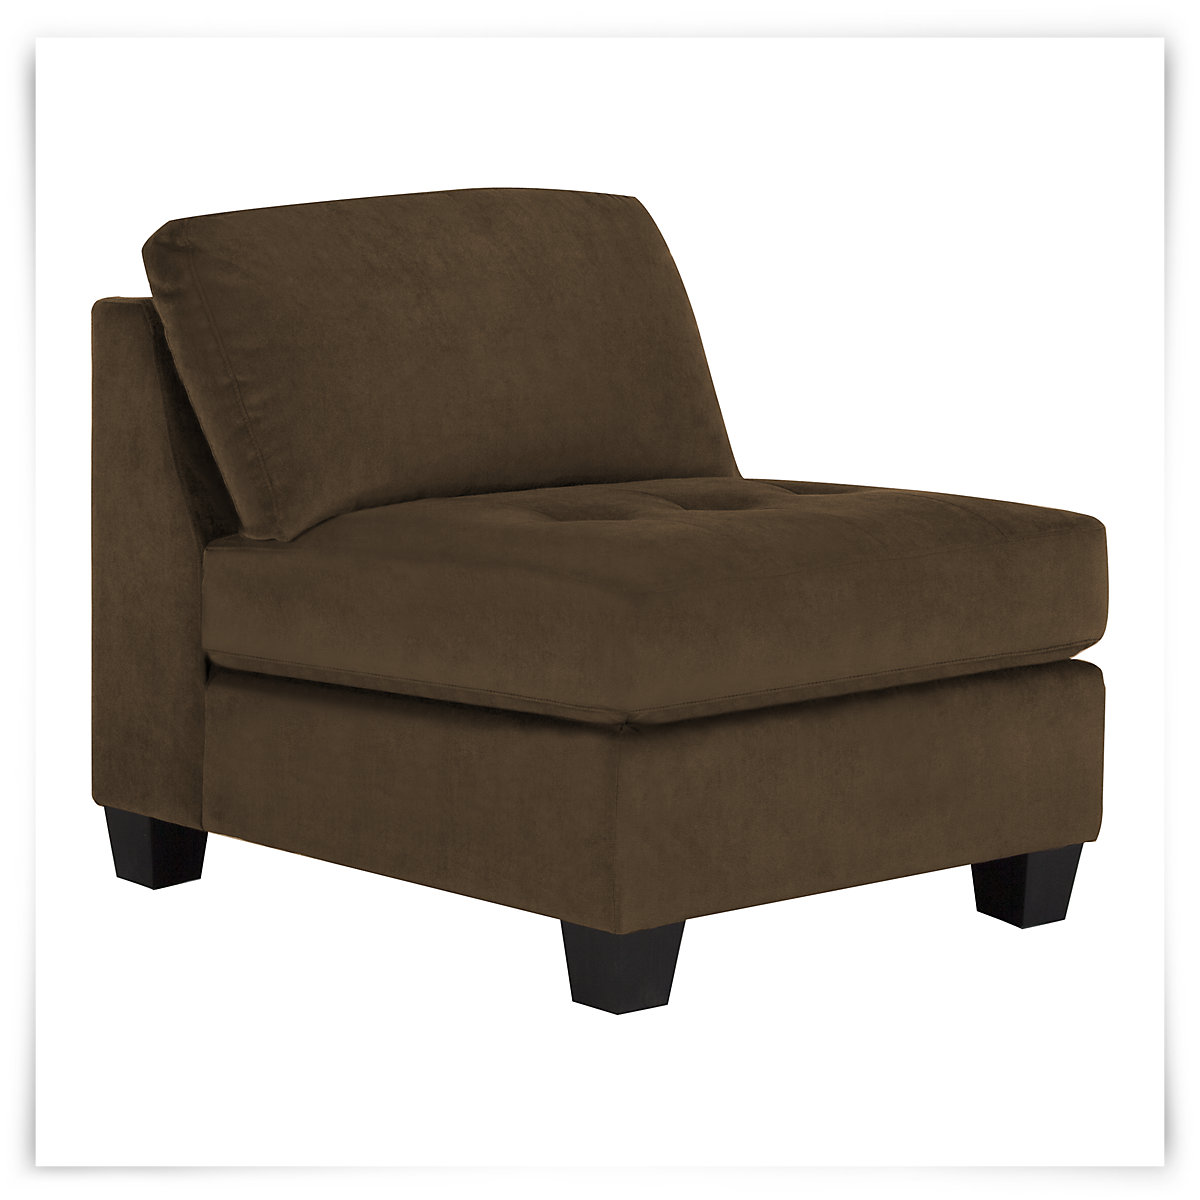 City Furniture Mercer2 Dk Brown Microfiber Armless Chair